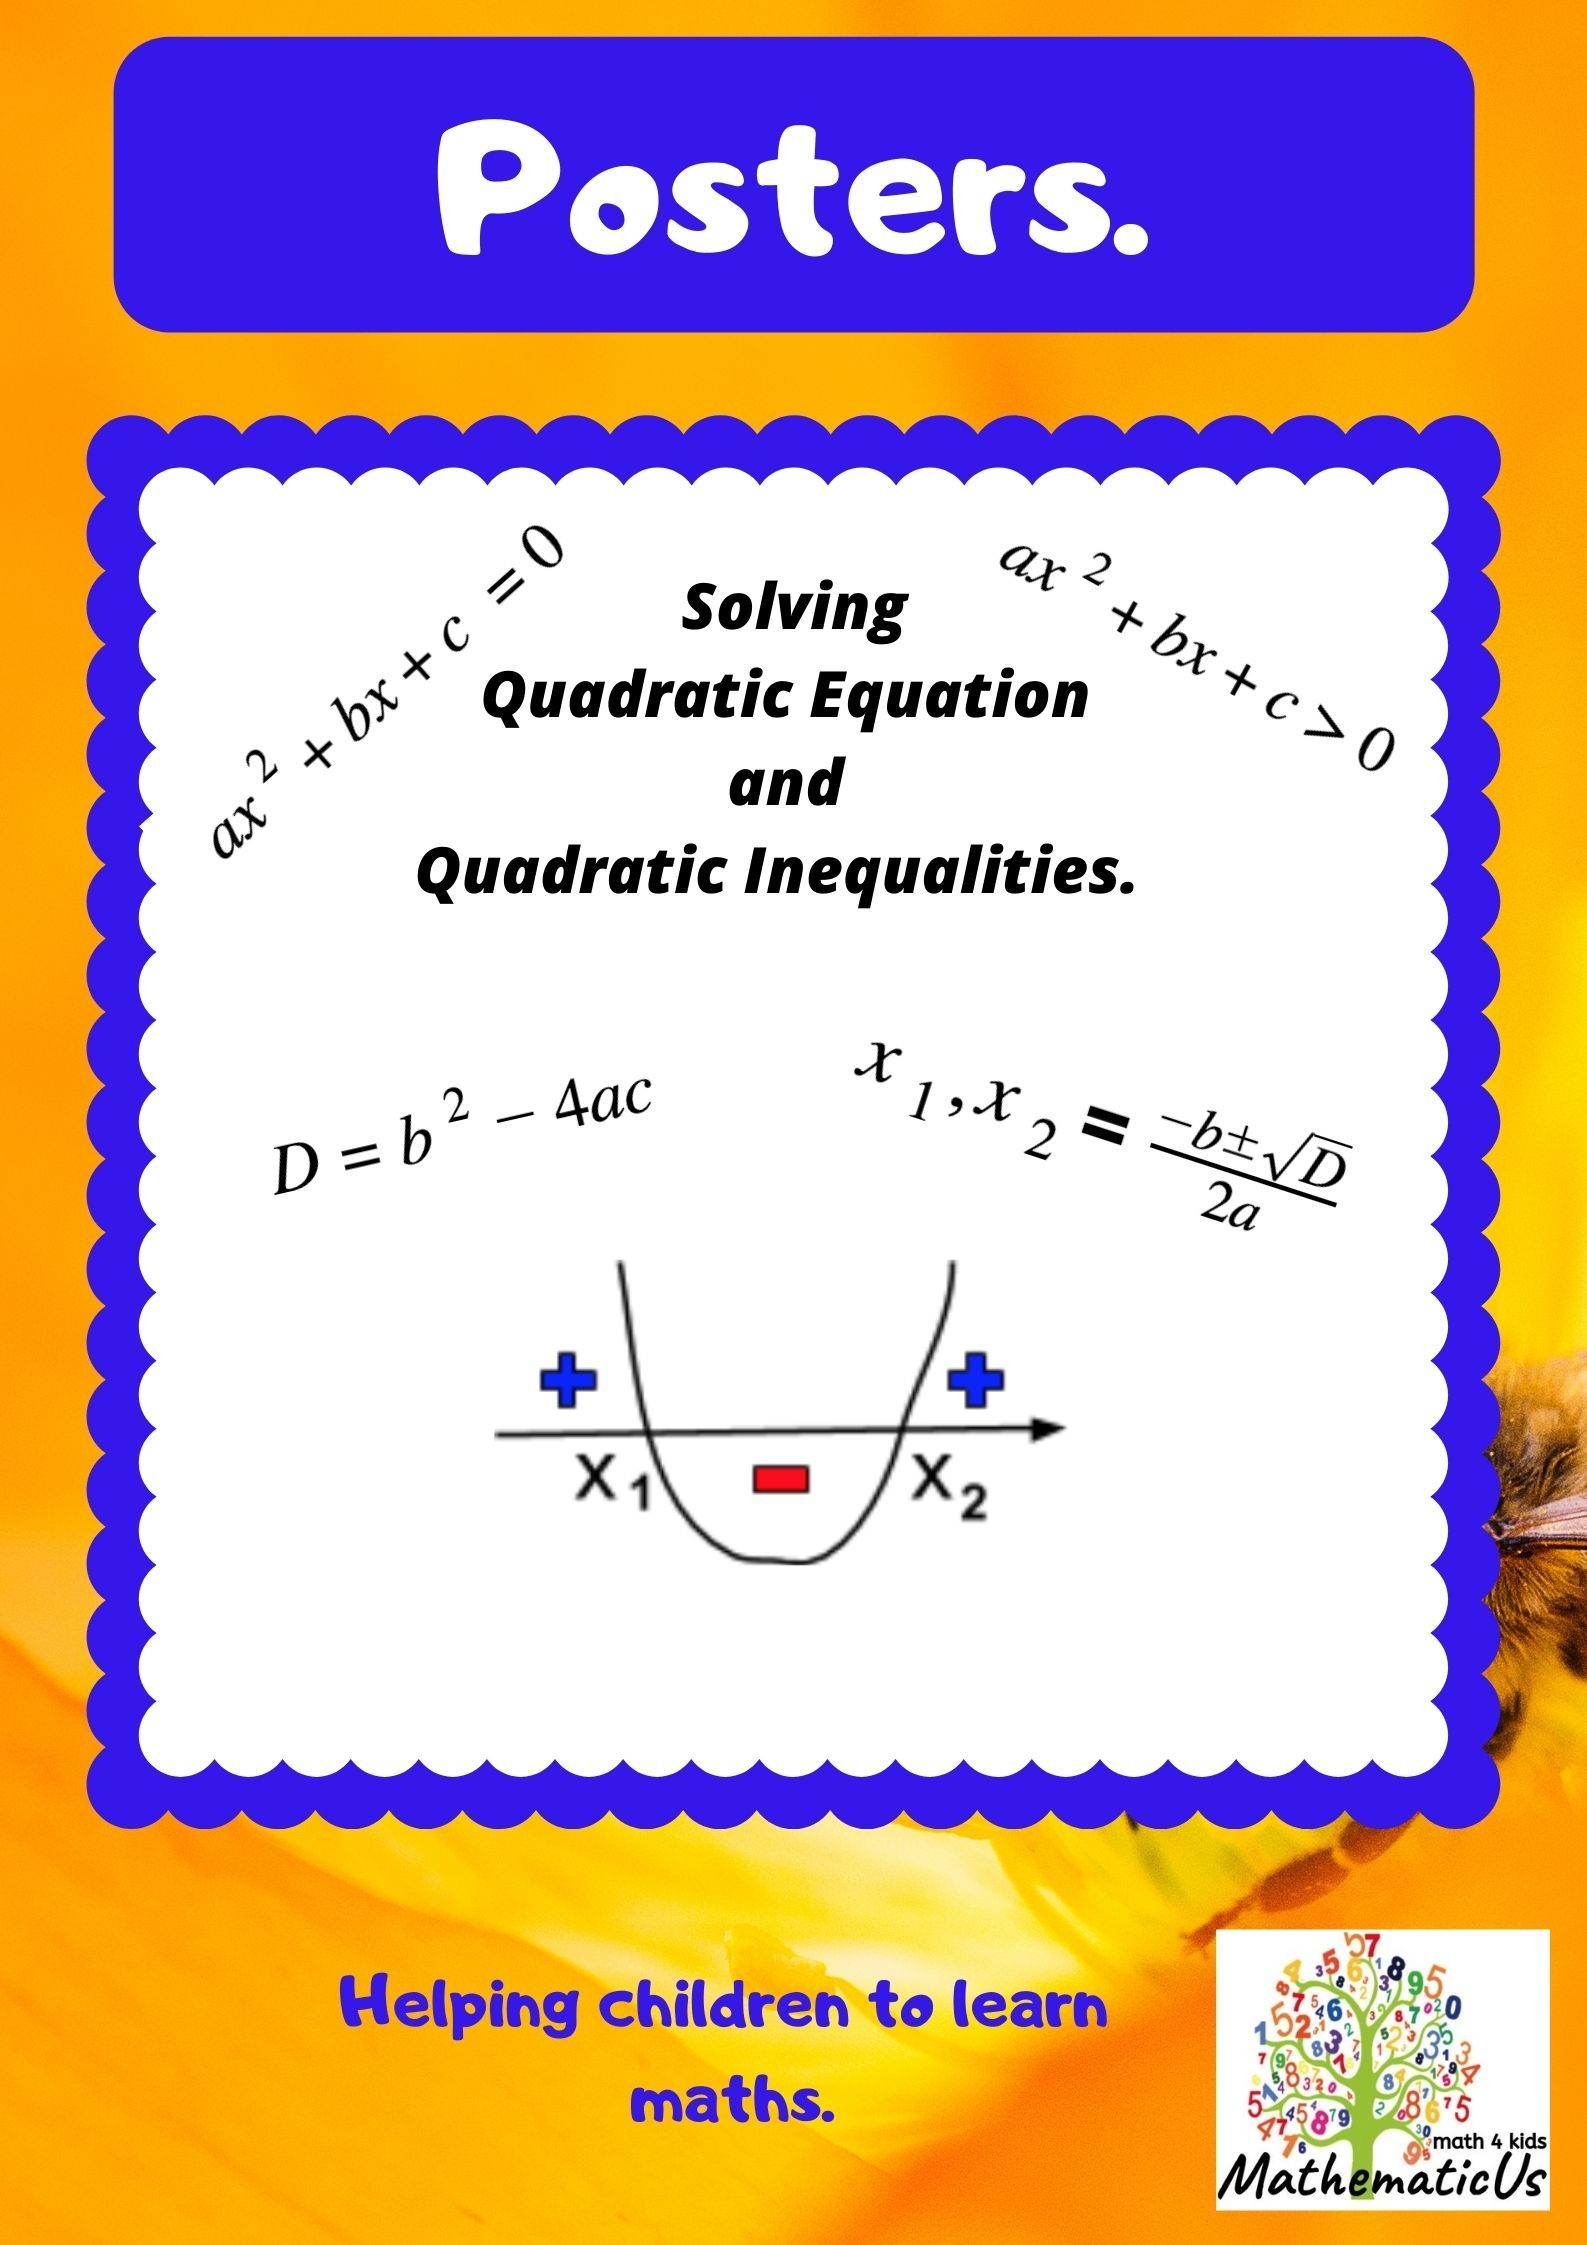 Quadratic Equations And Inequalities Solution Posters And Support Quadratics Math Word Walls Math Workshop Stations